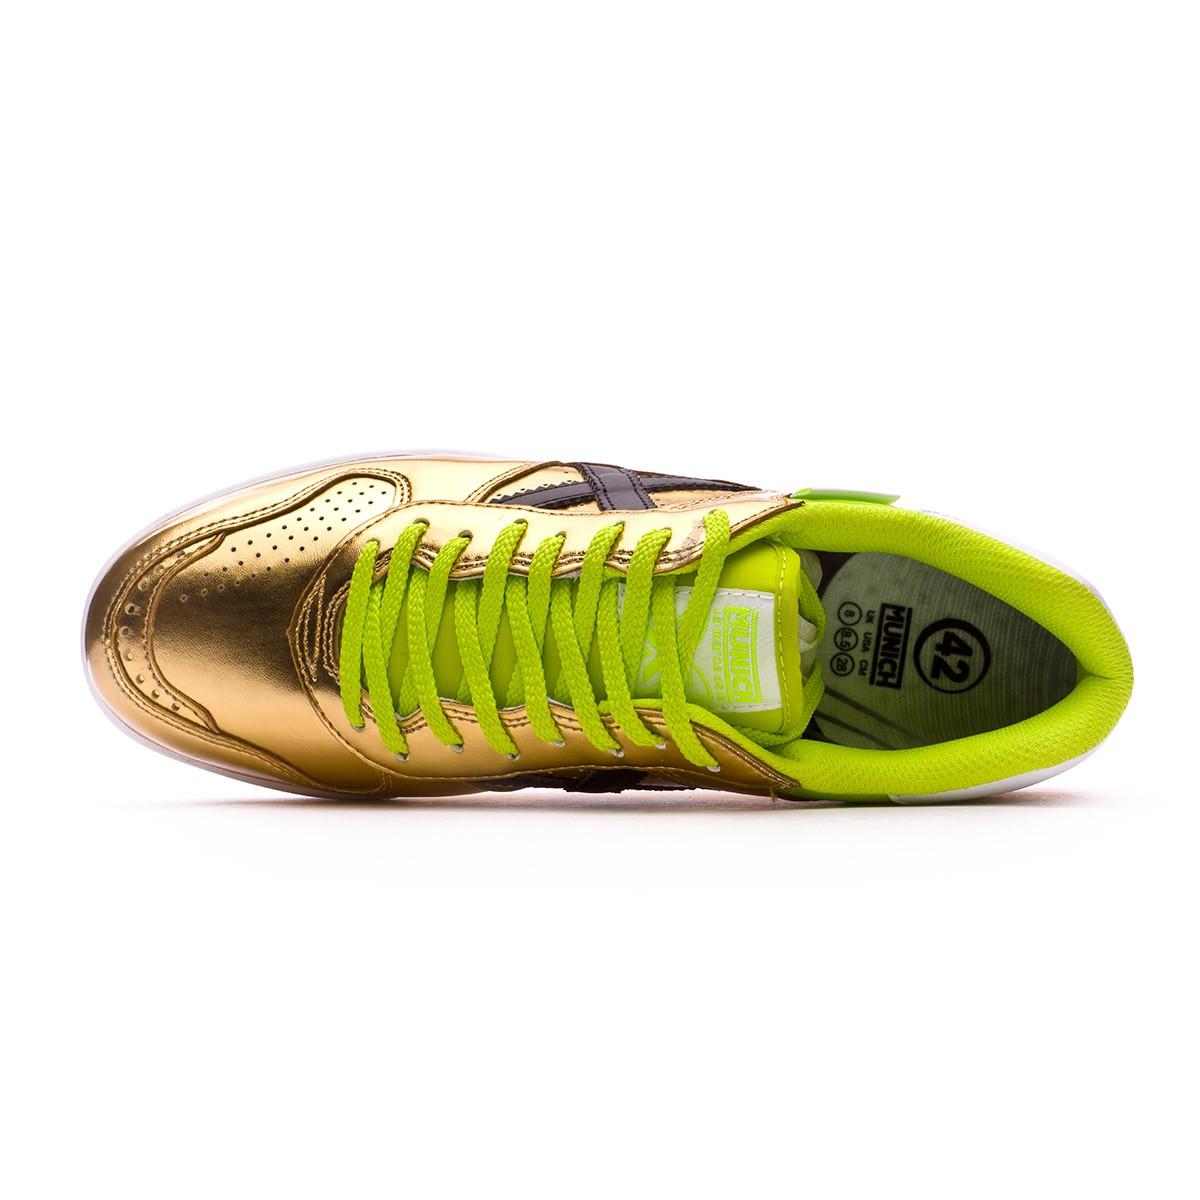 Zapatilla Soccer Lima Continental Munich Leaked Oro V2 7waqPxB7